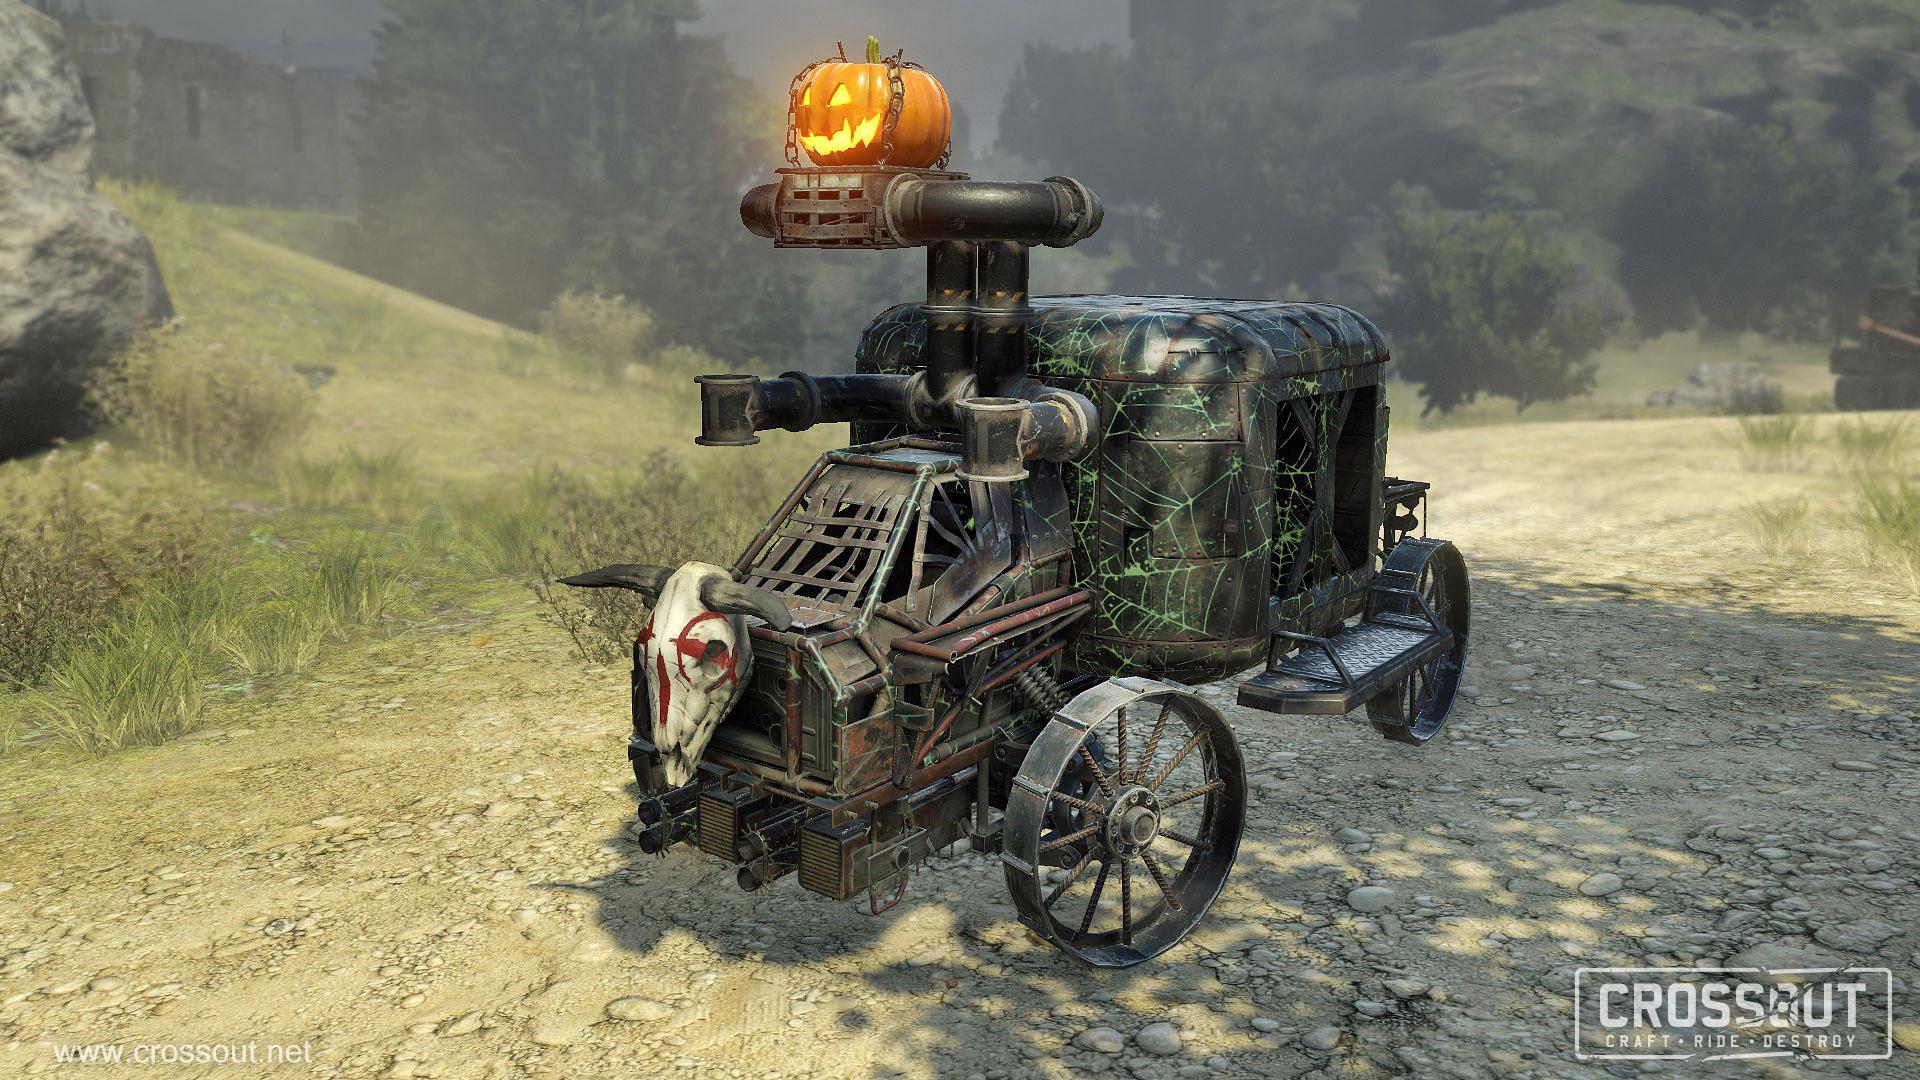 Crossout Halloween